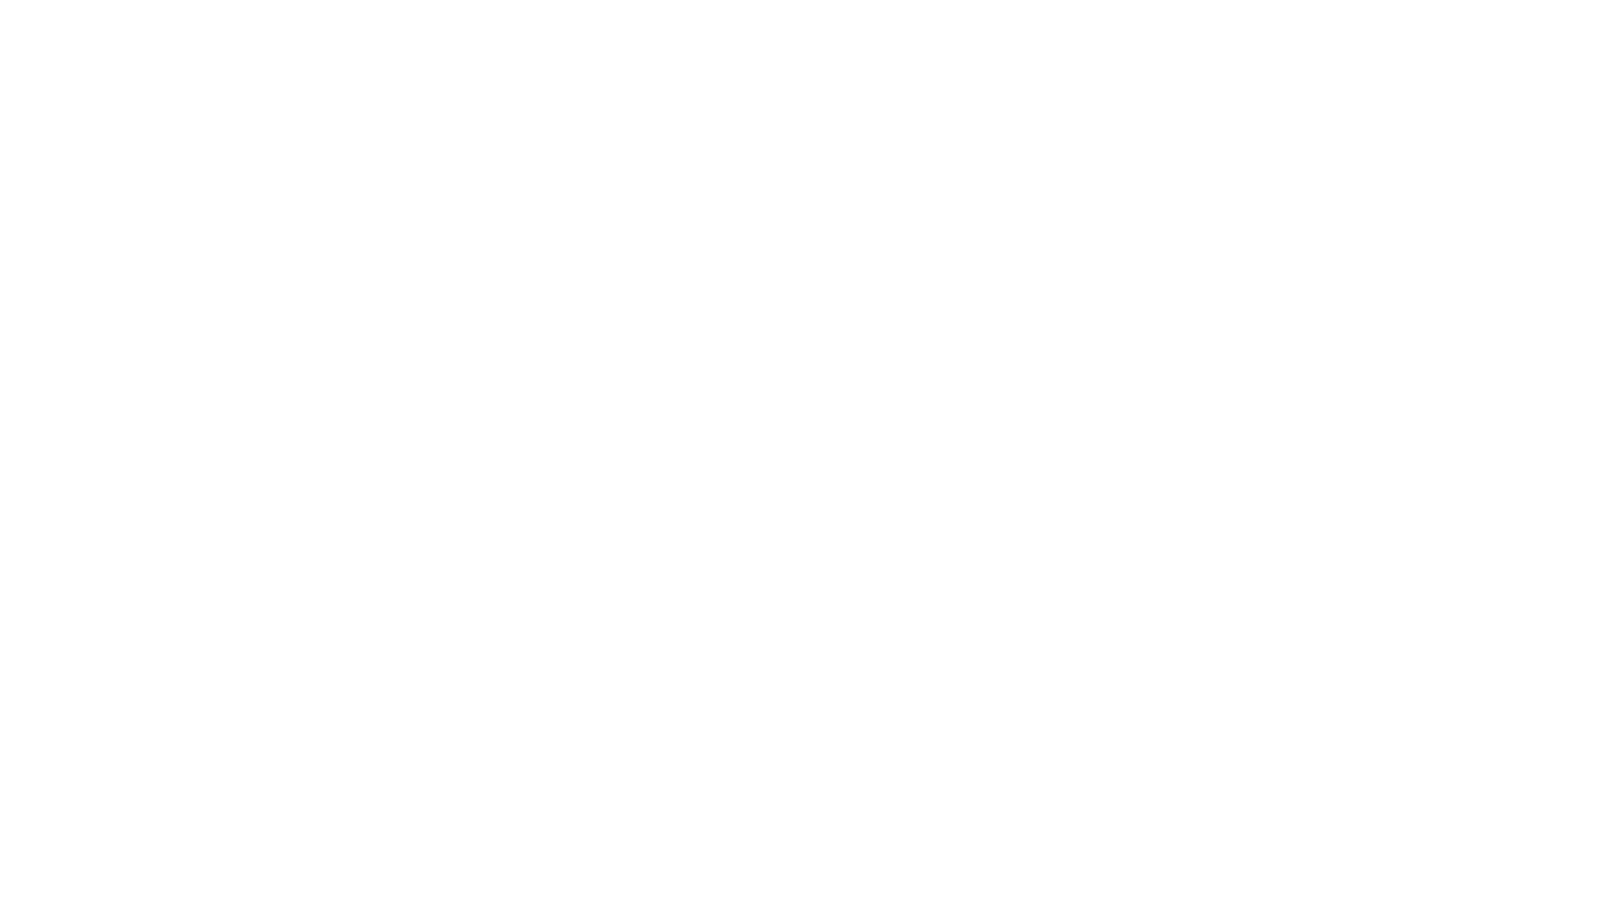 This video will walk you through the steps for requesting an article scan using Falvey Memorial Library's interlibrary loan request form (https://villanova-illiad-oclc-org.ezp1.villanova.edu/illiad/illiad.dll?Action=10&Form=22)